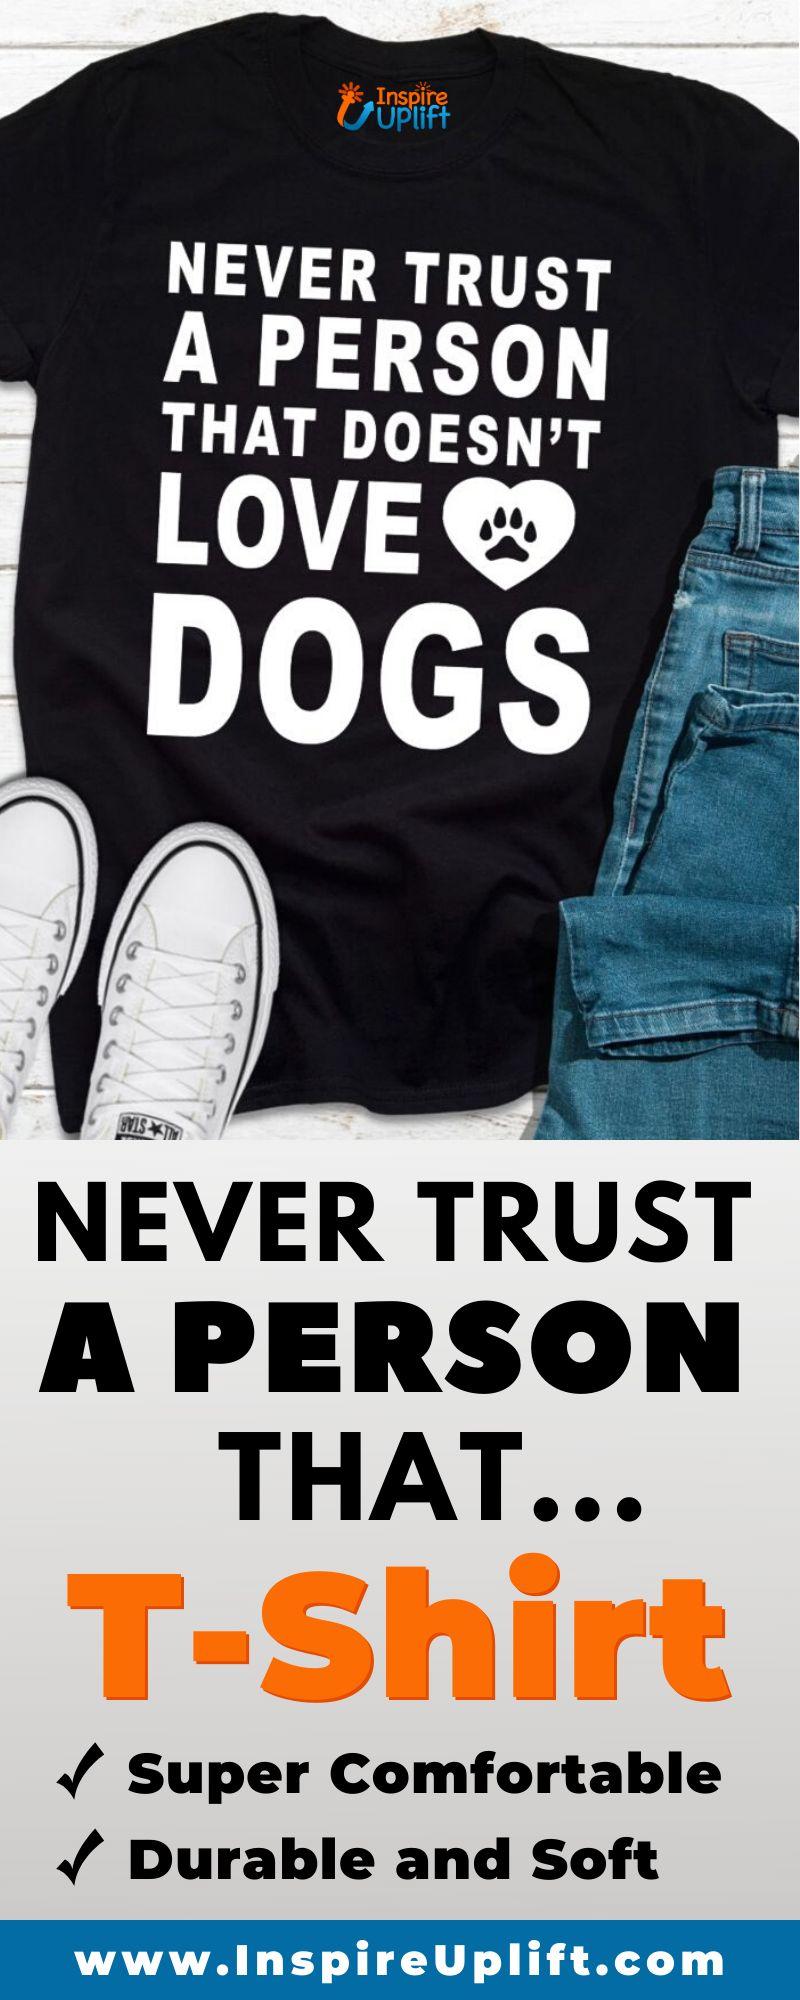 Never Trust A Person That... T-Shirt 😍 InspireUplift.com